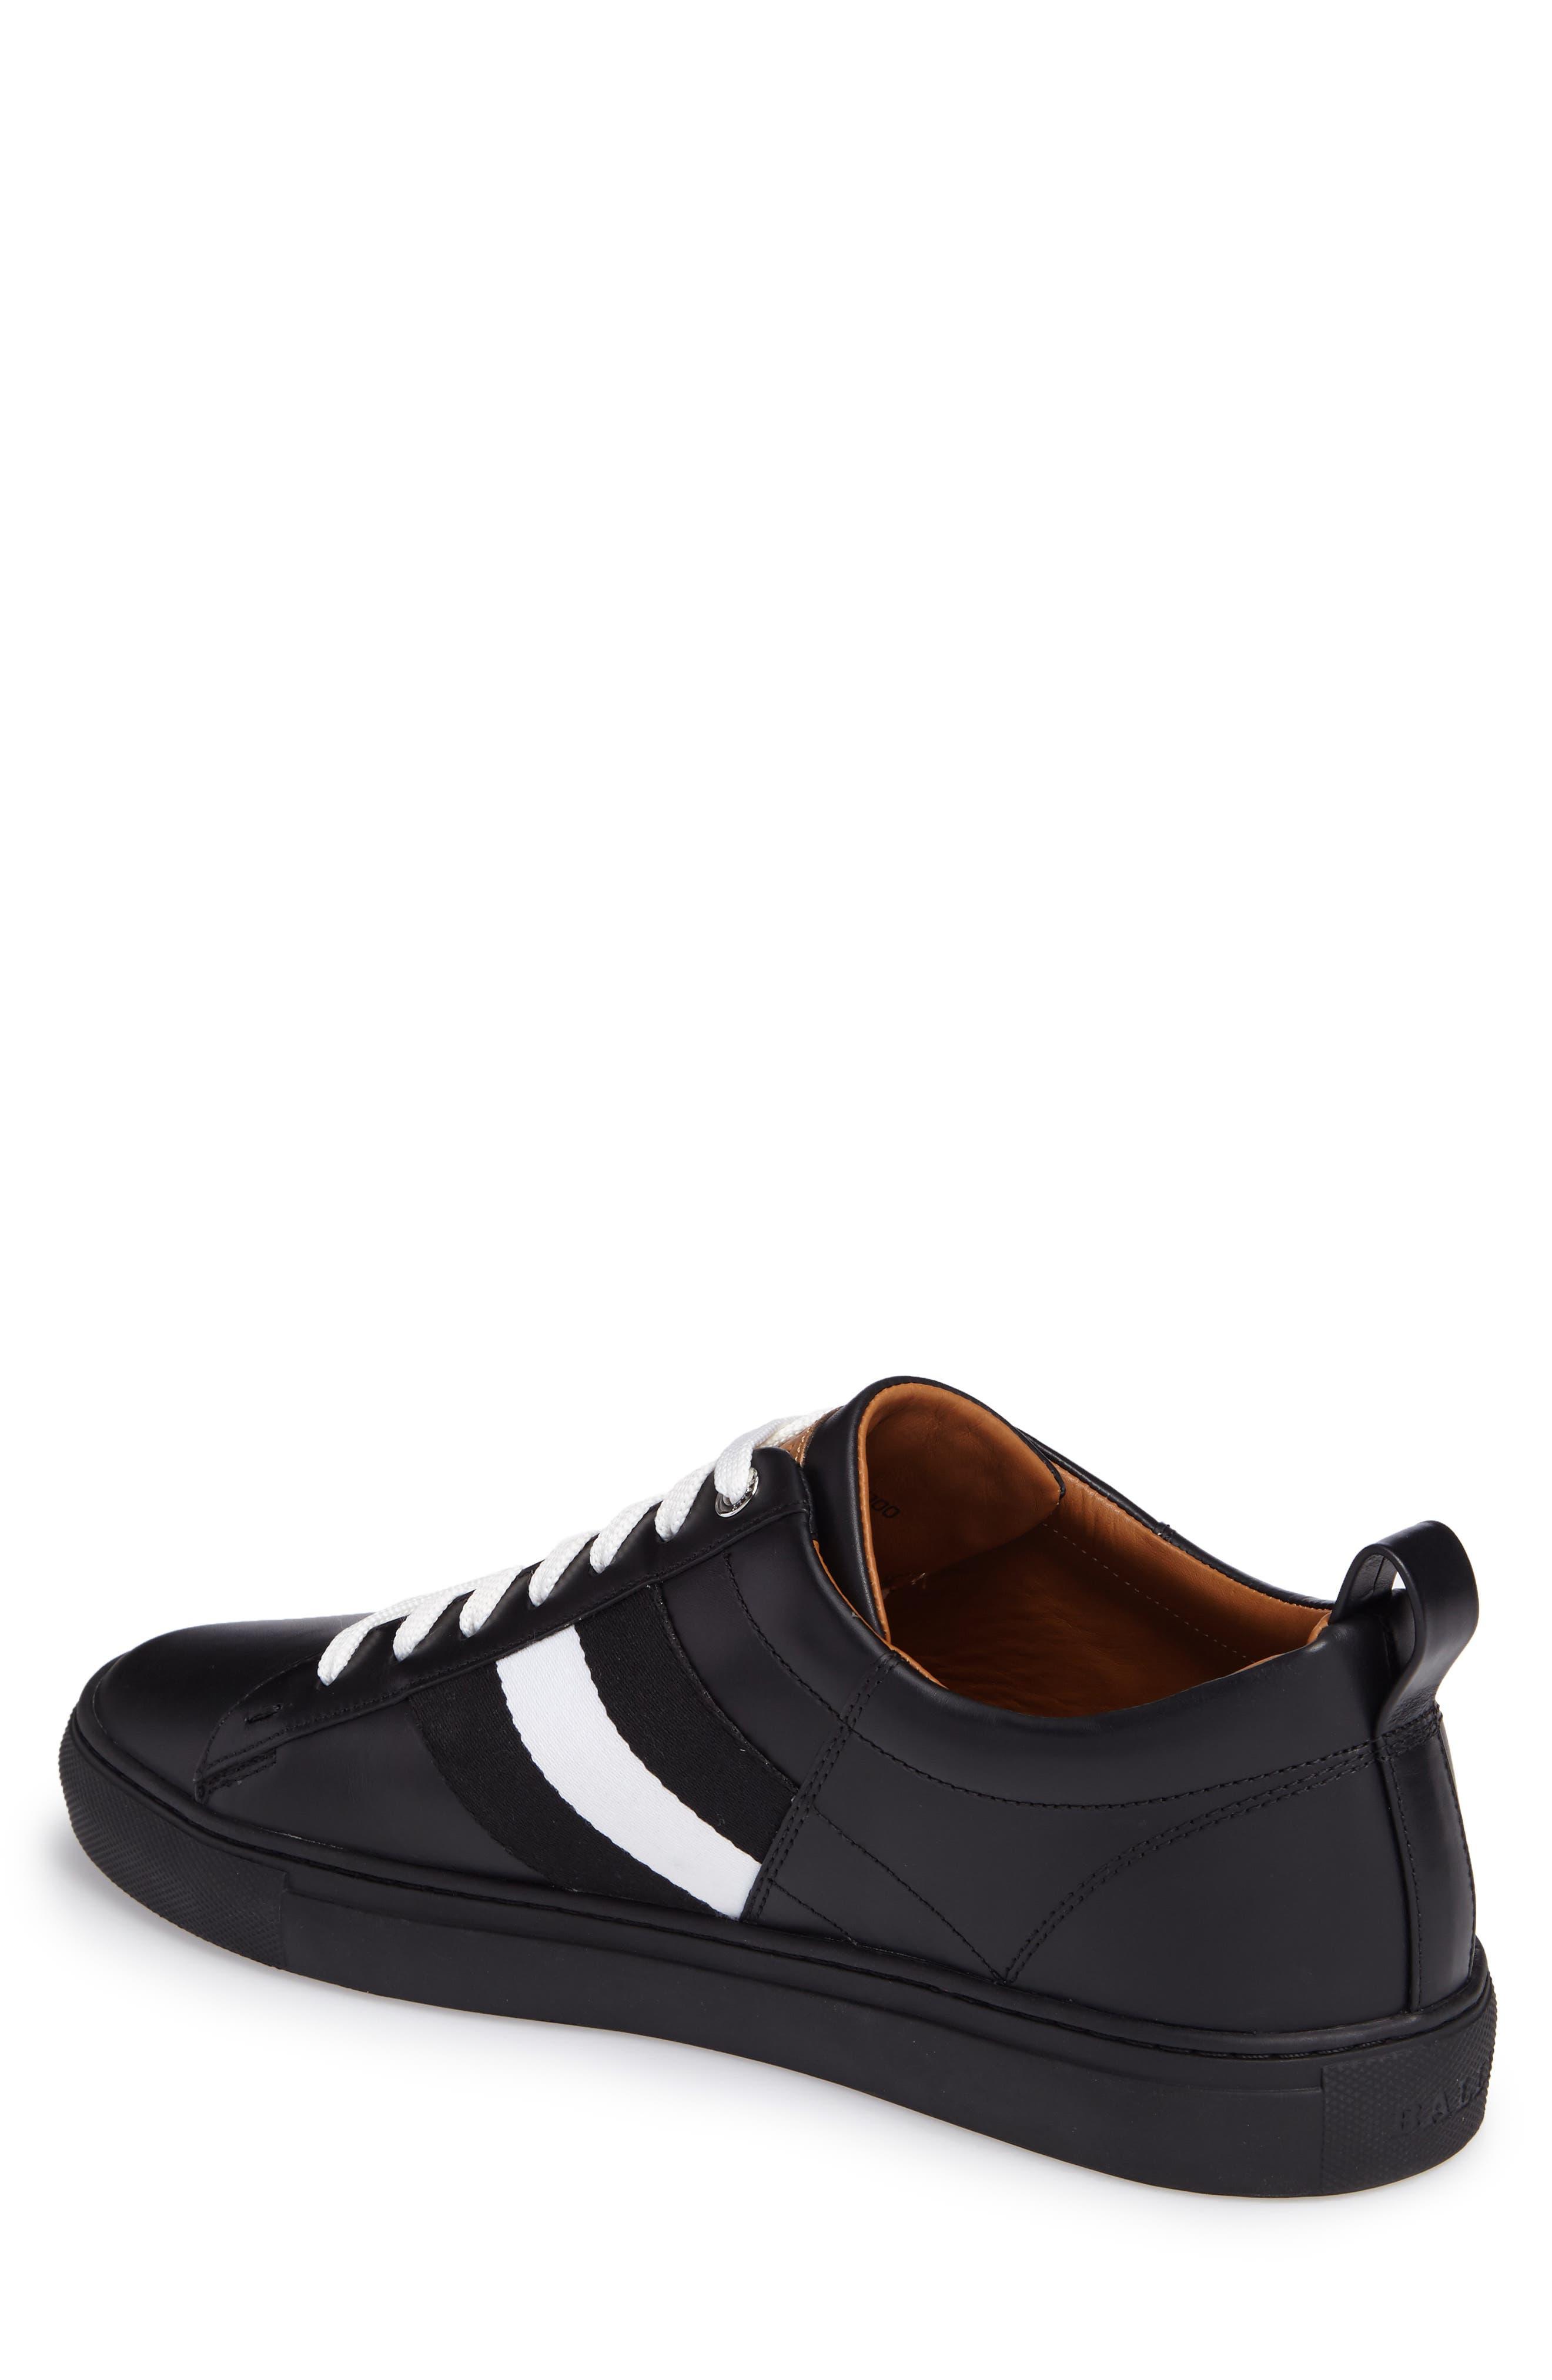 'Helvio' Sneaker,                             Alternate thumbnail 6, color,